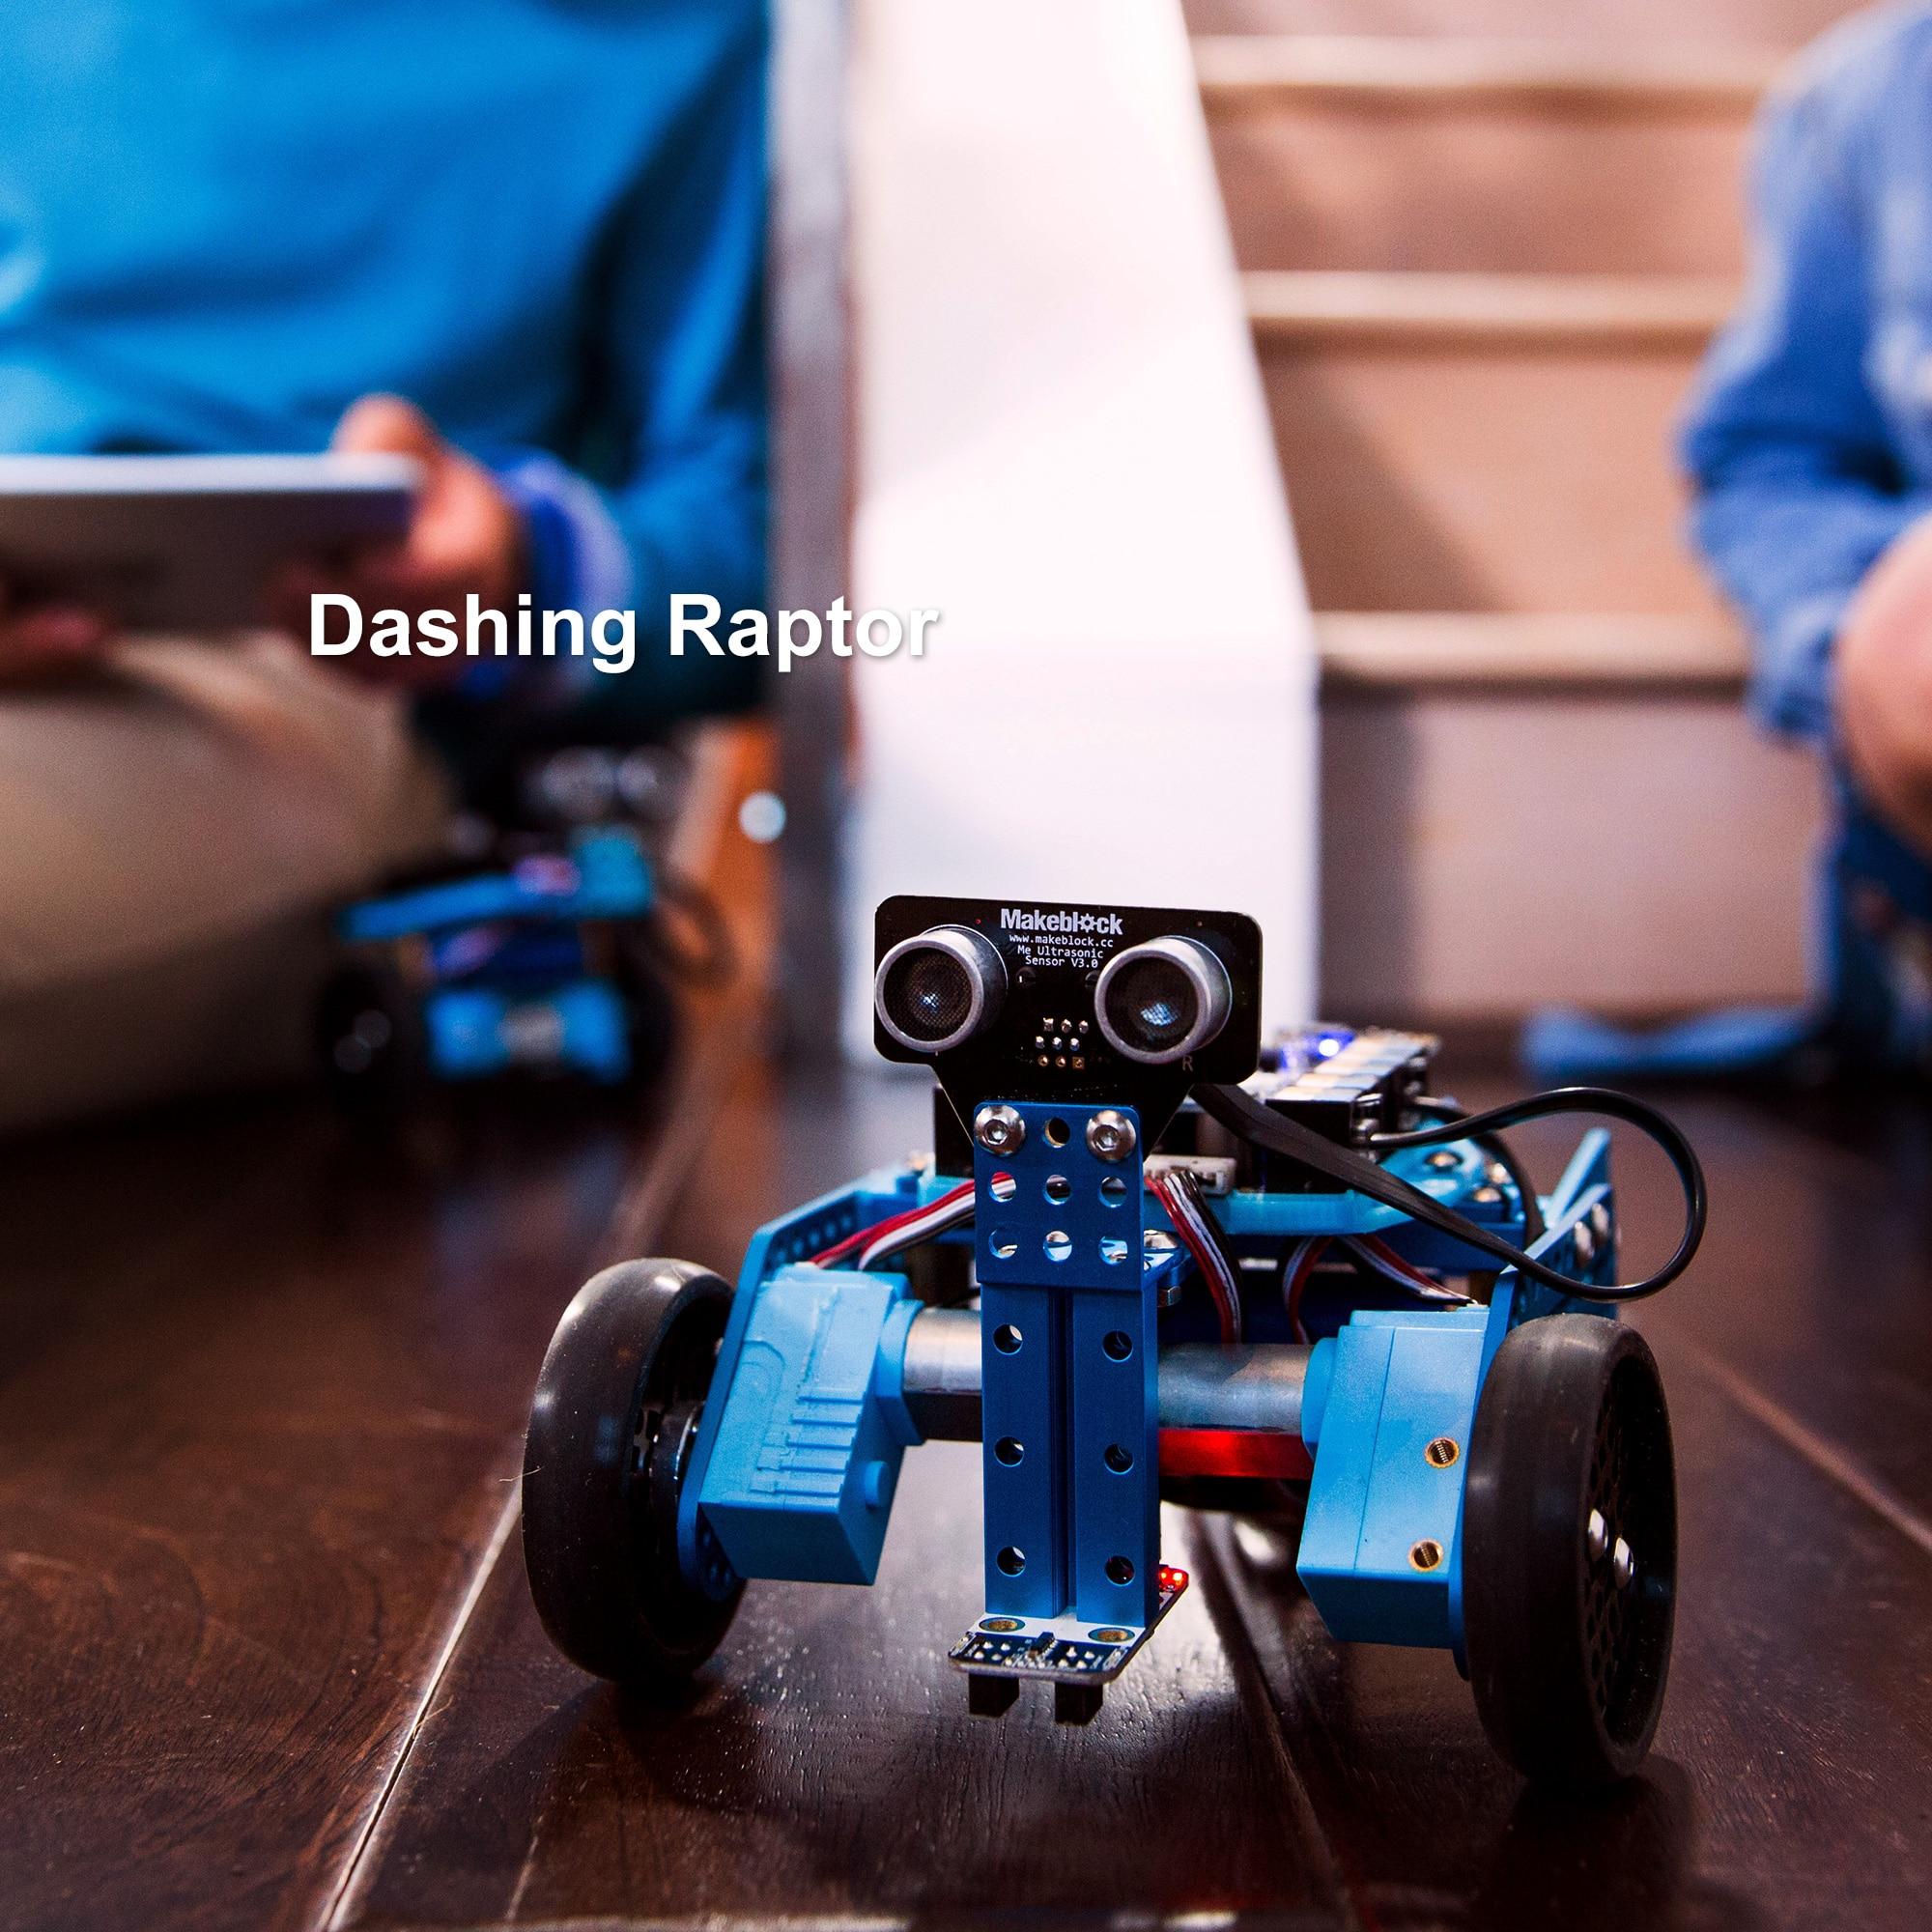 Makeblock Programmable mBot Ranger Robot Kit, Arduino,STEM Education, 3 in 1 Programmable Robotic for Kids, Age 12+ 3